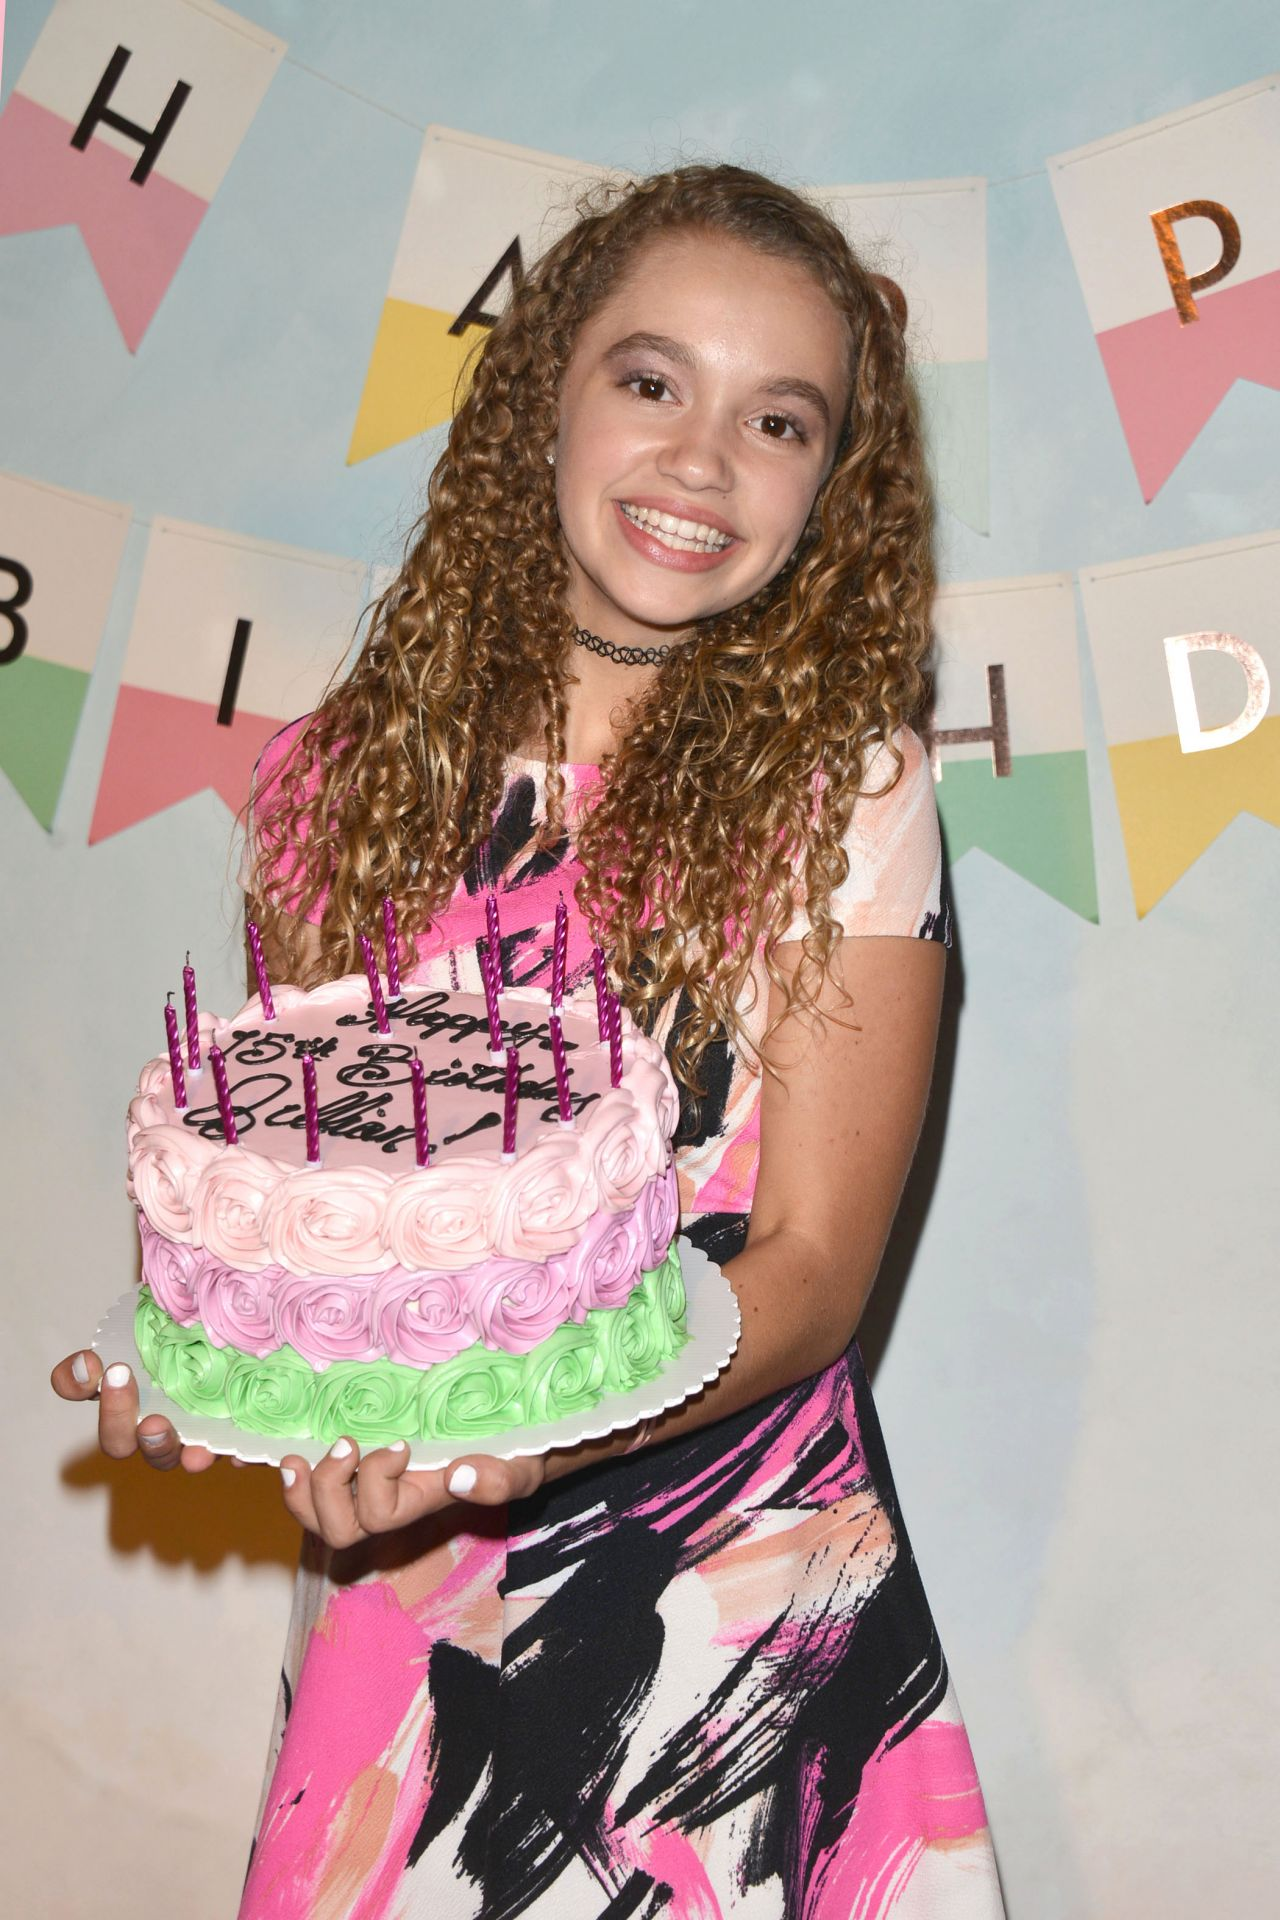 jillian shea spaeder � jillian shea spaeder 15th birthday